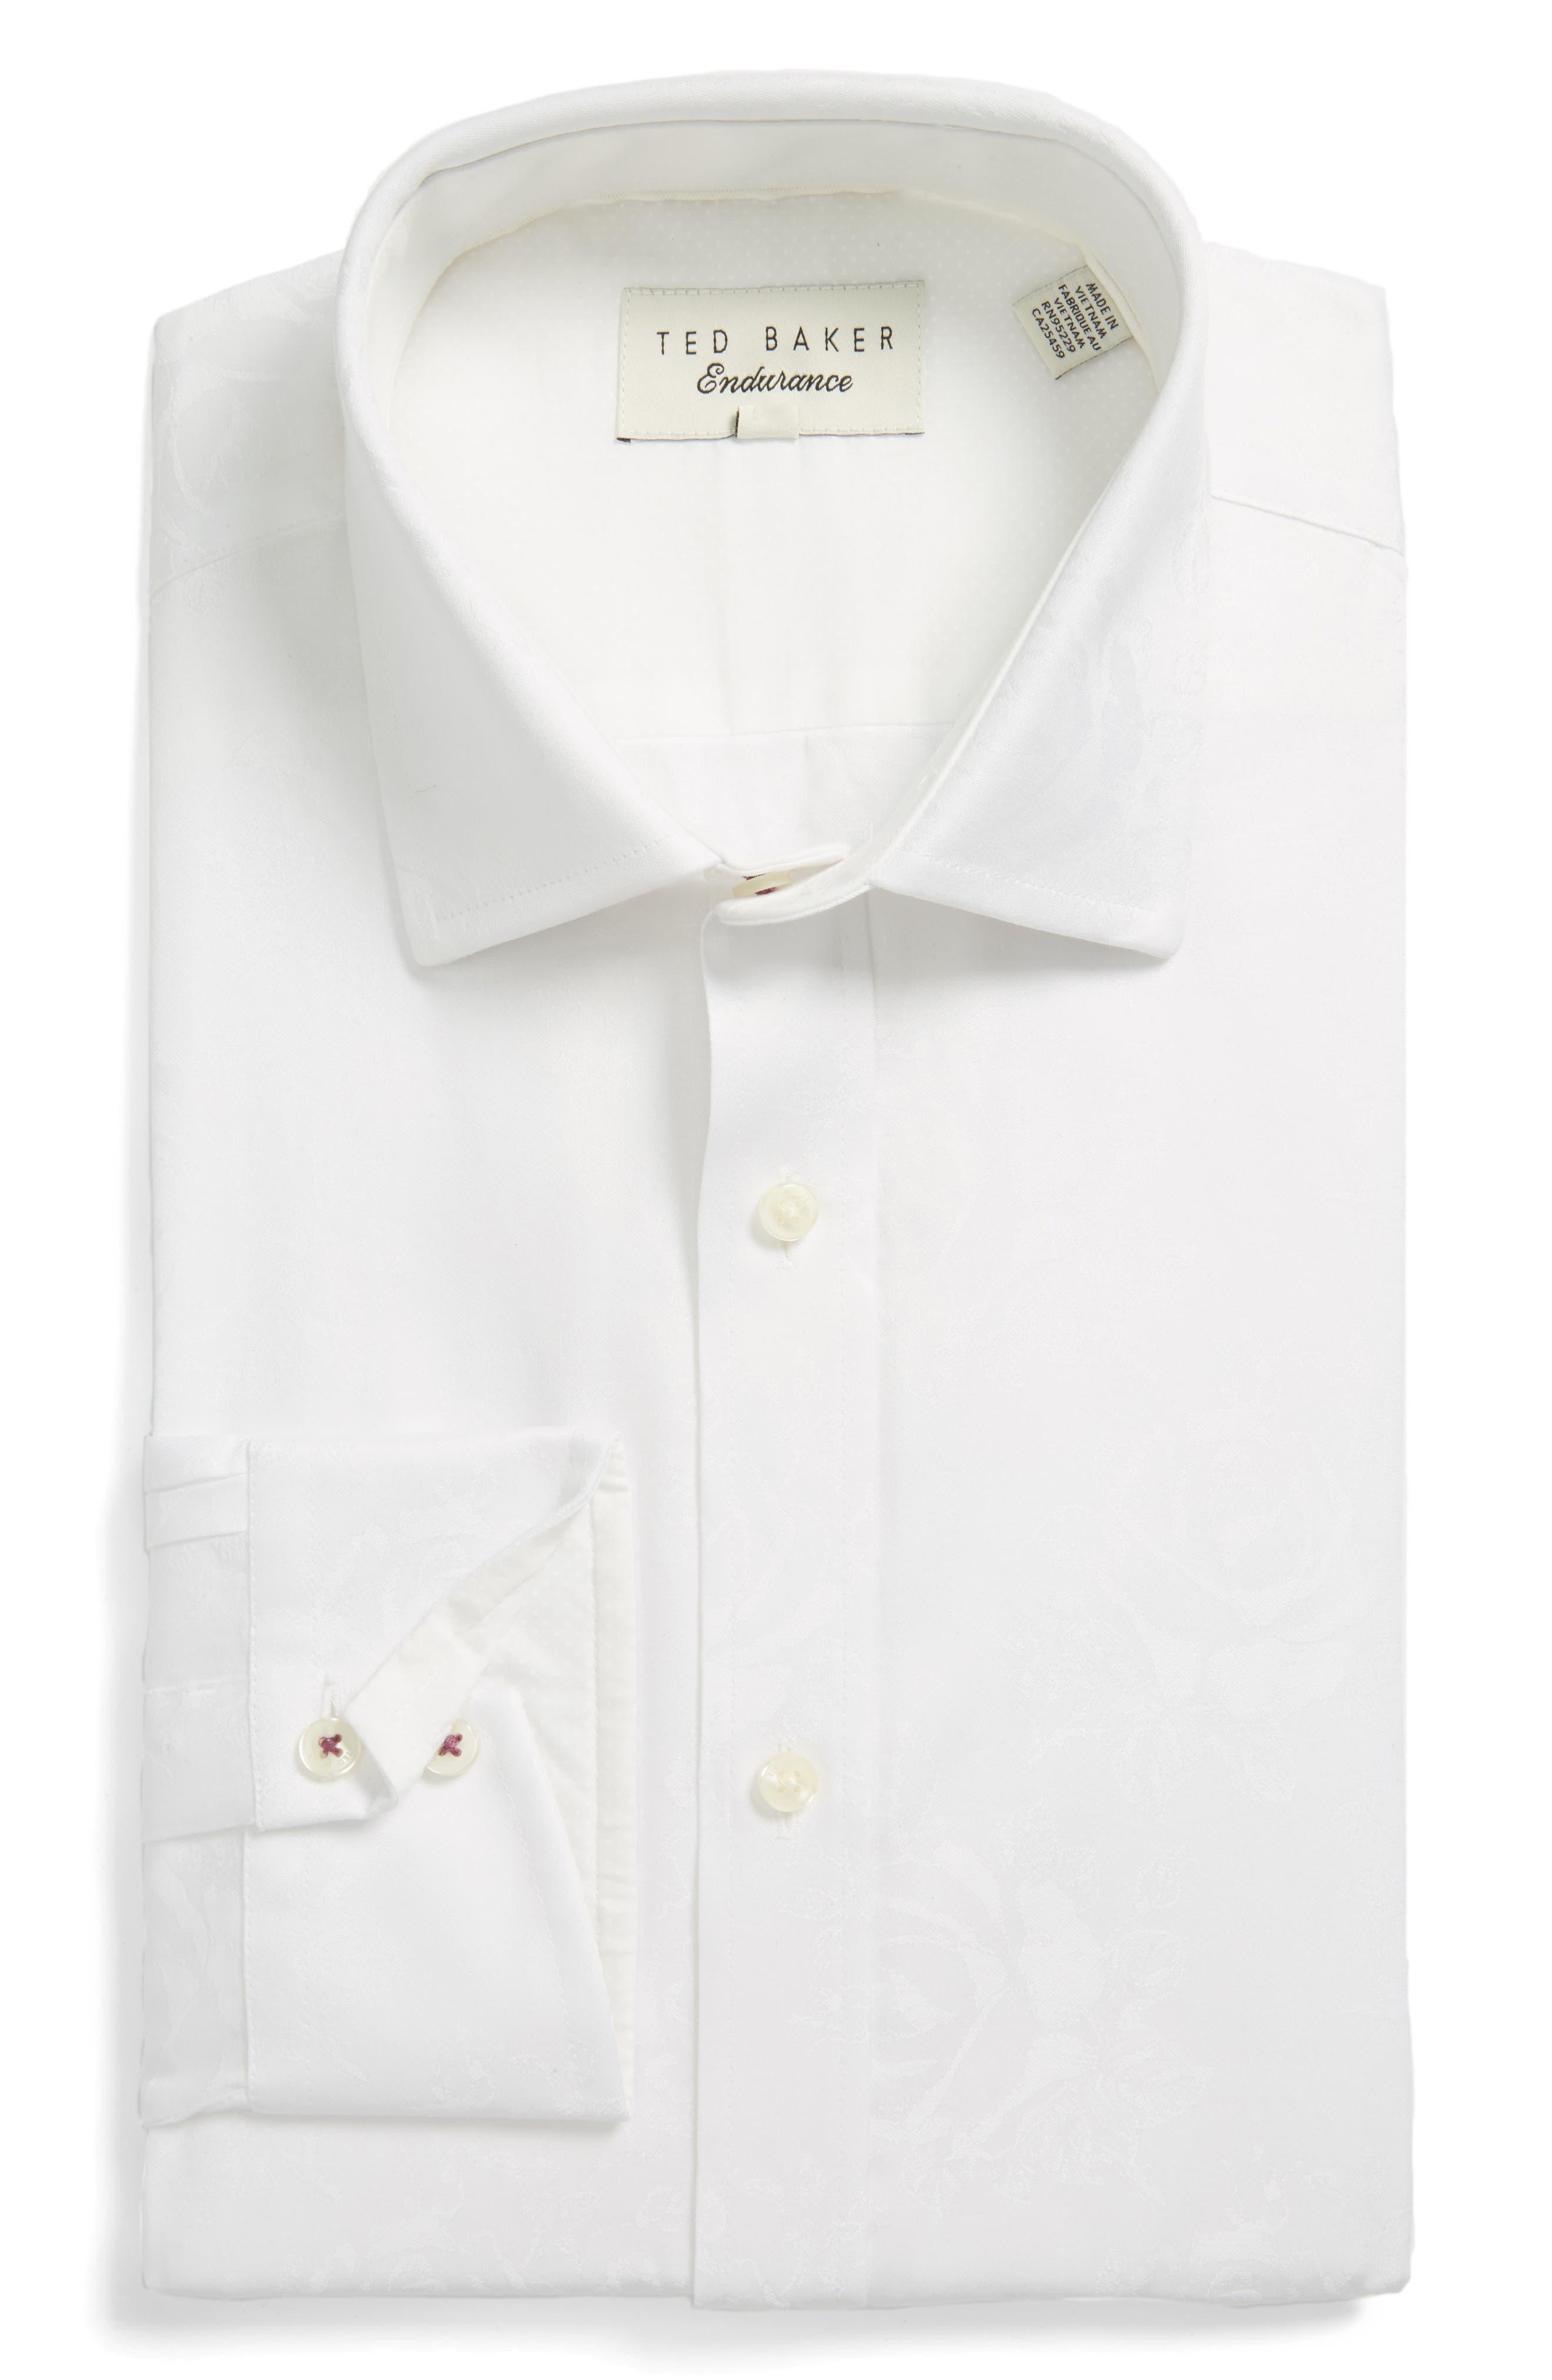 Main Image - Ted Baker London Trim Fit Floral Dress Shirt